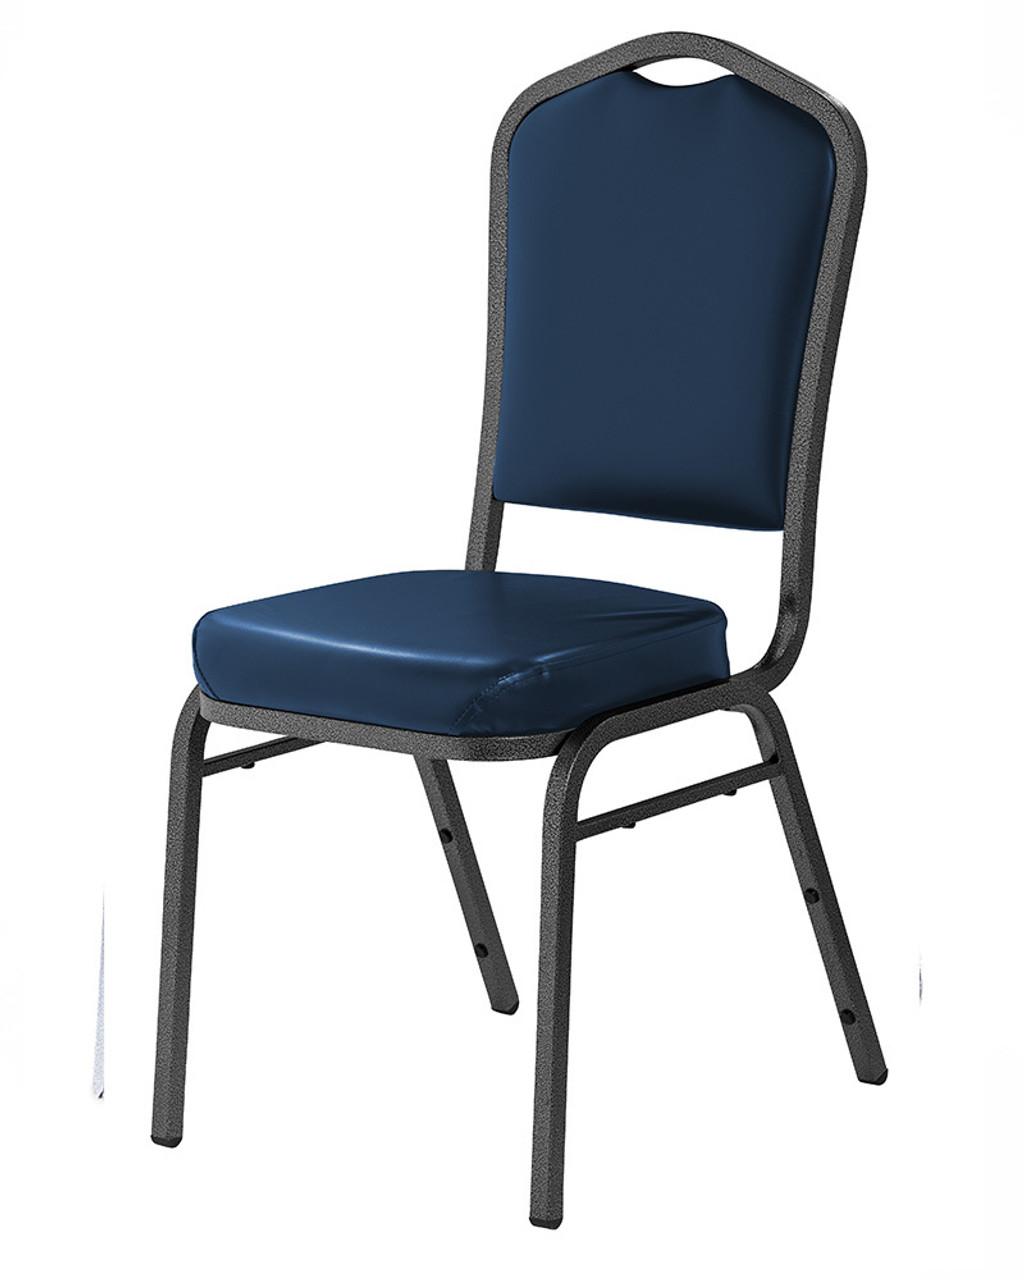 Astounding Banquet Chairs For Sale Spiritservingveterans Wood Chair Design Ideas Spiritservingveteransorg